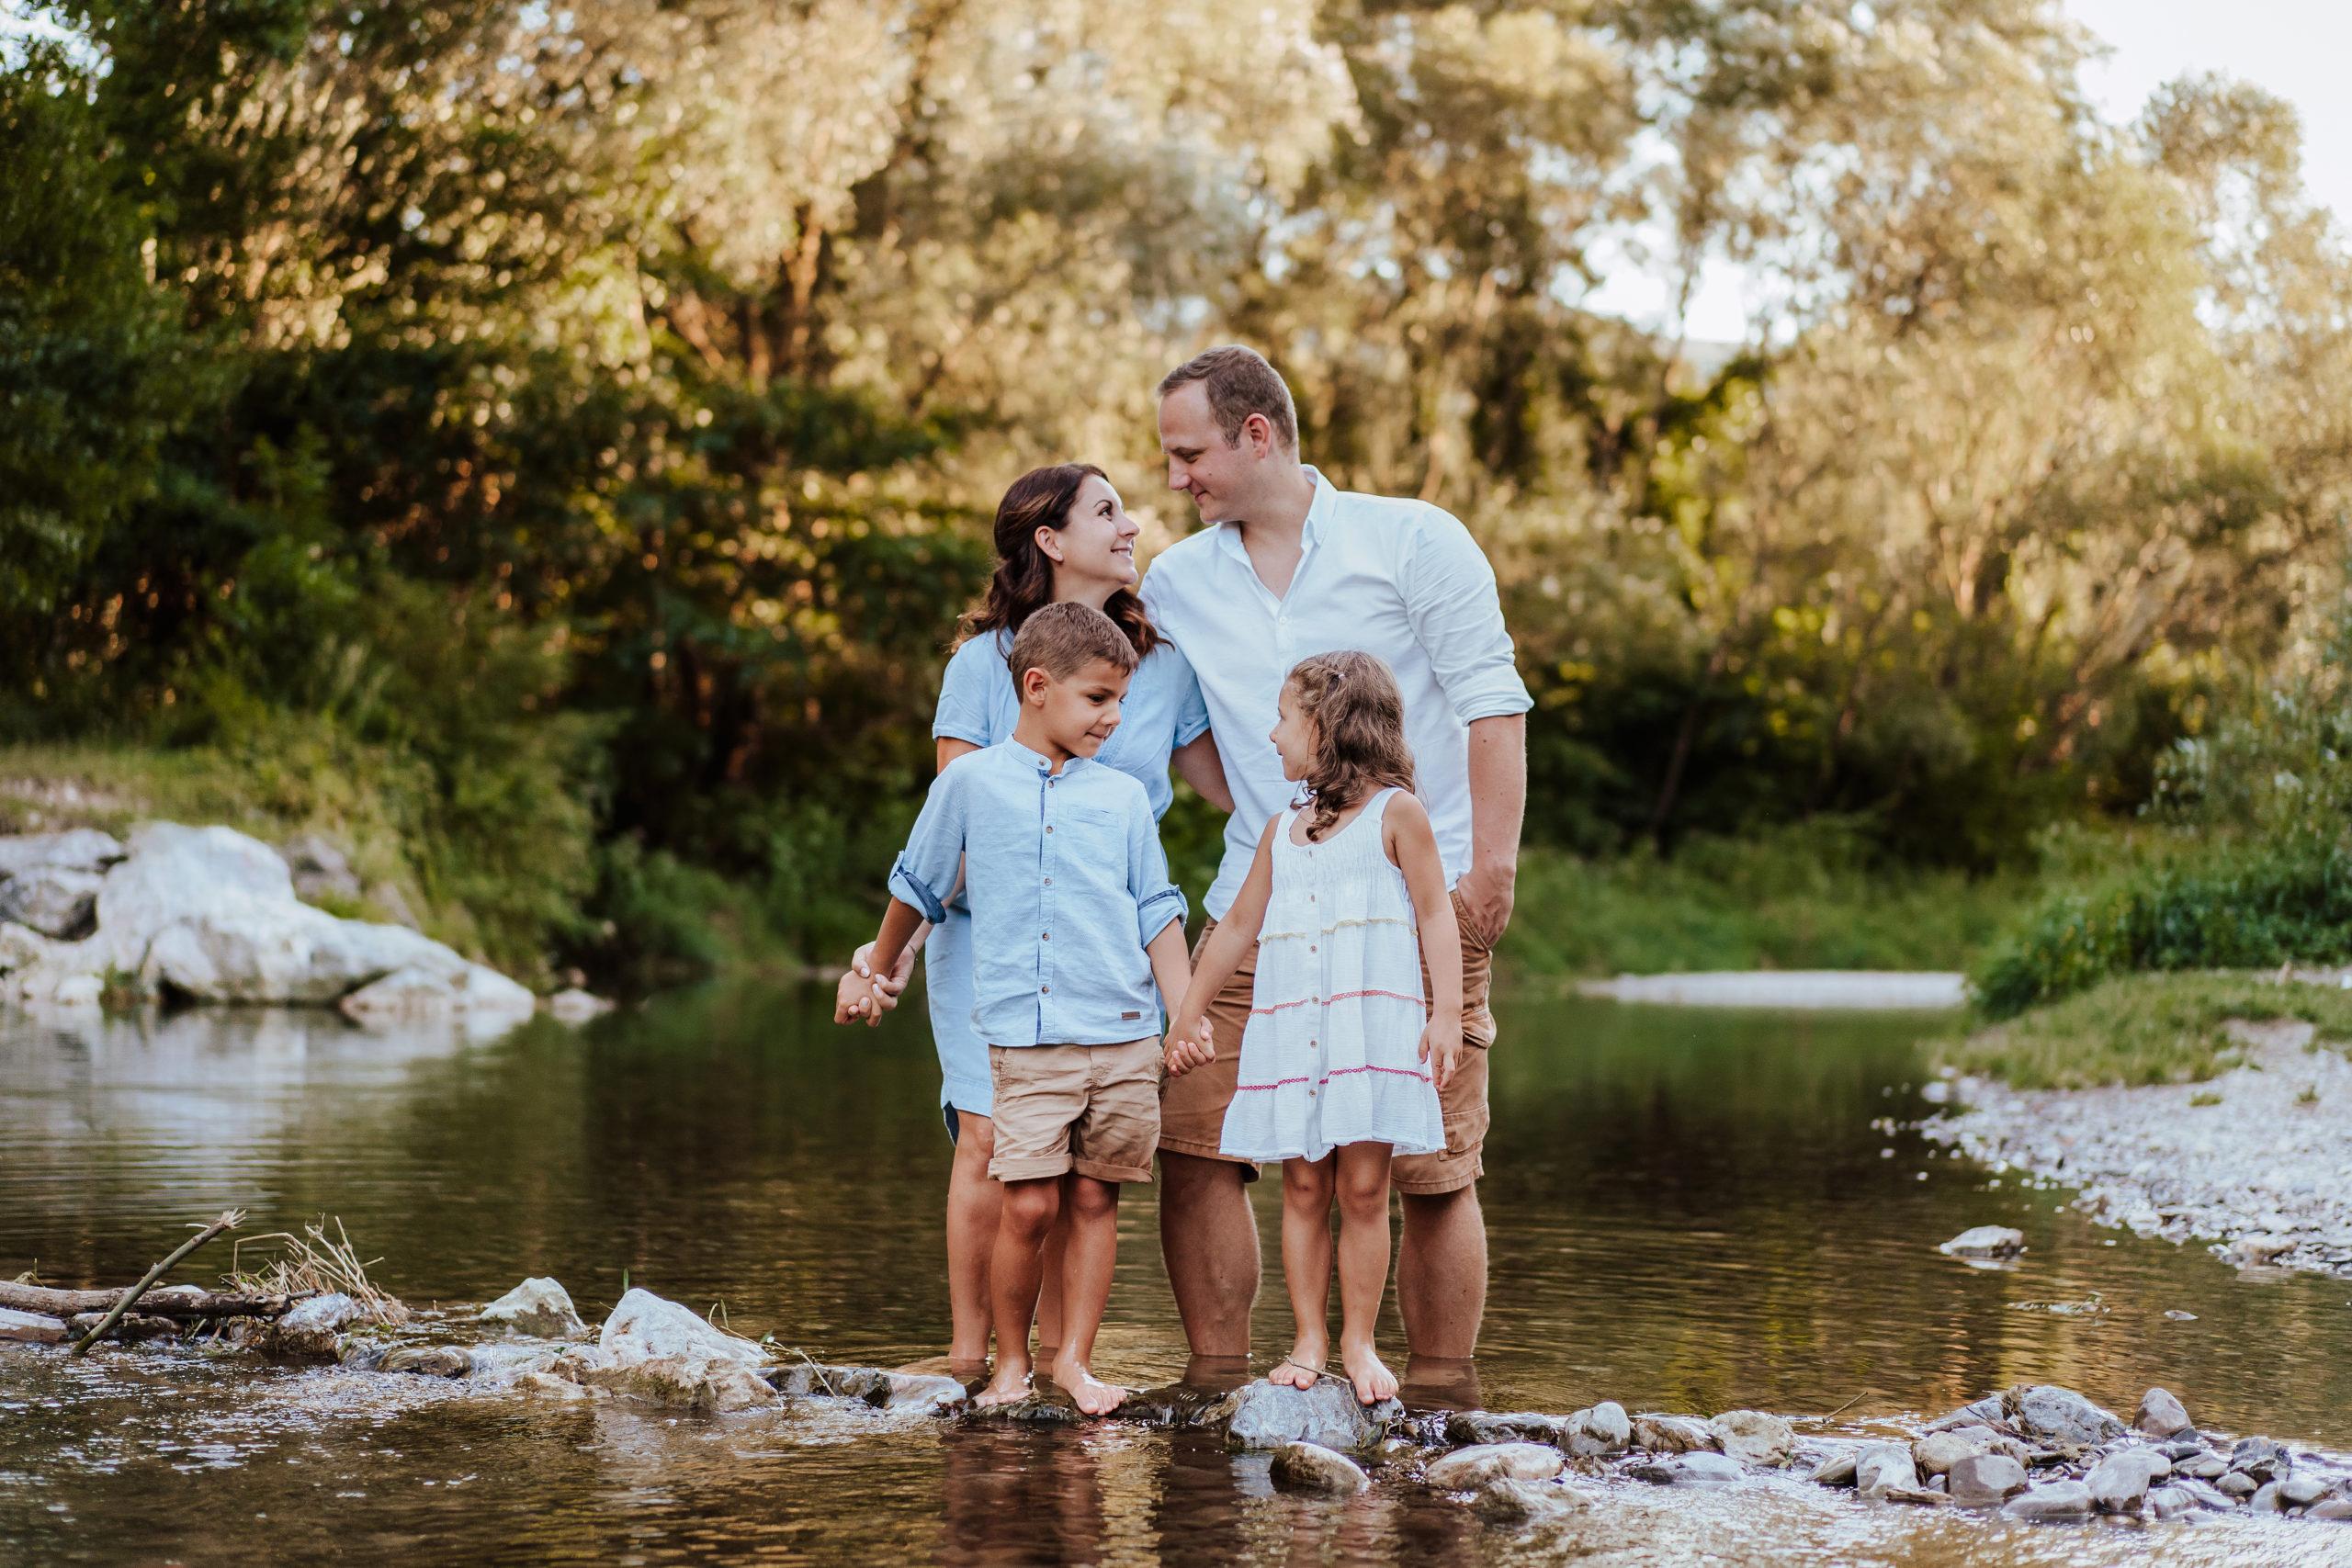 natuerlichefamilienfotos-wienumgebung2